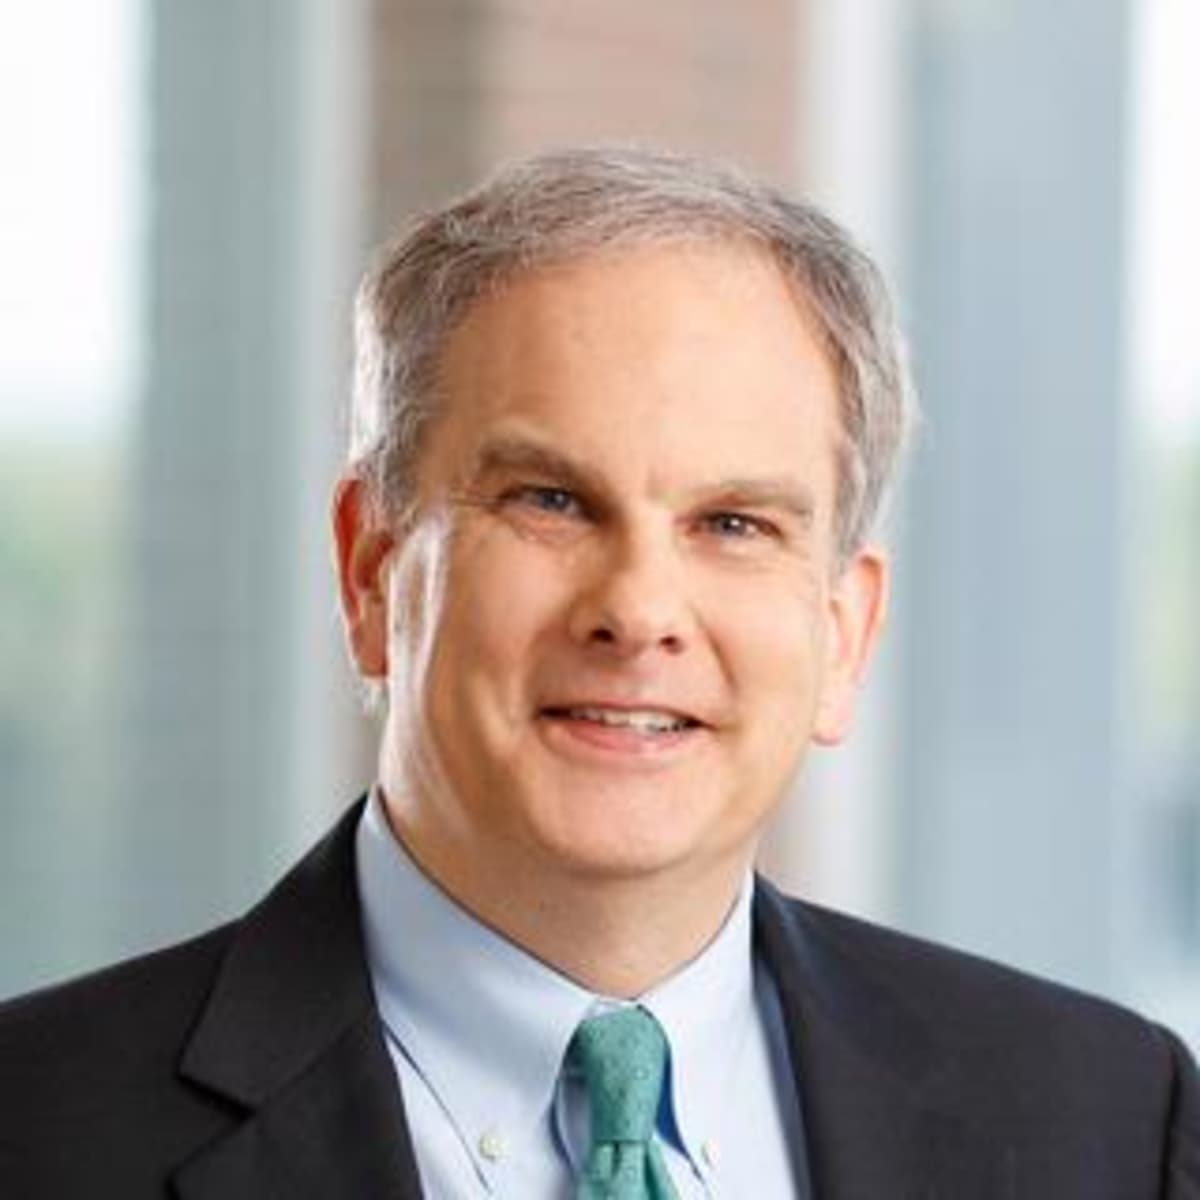 Dr Thomas Werth Md Rochester Ny Gastroenterologist